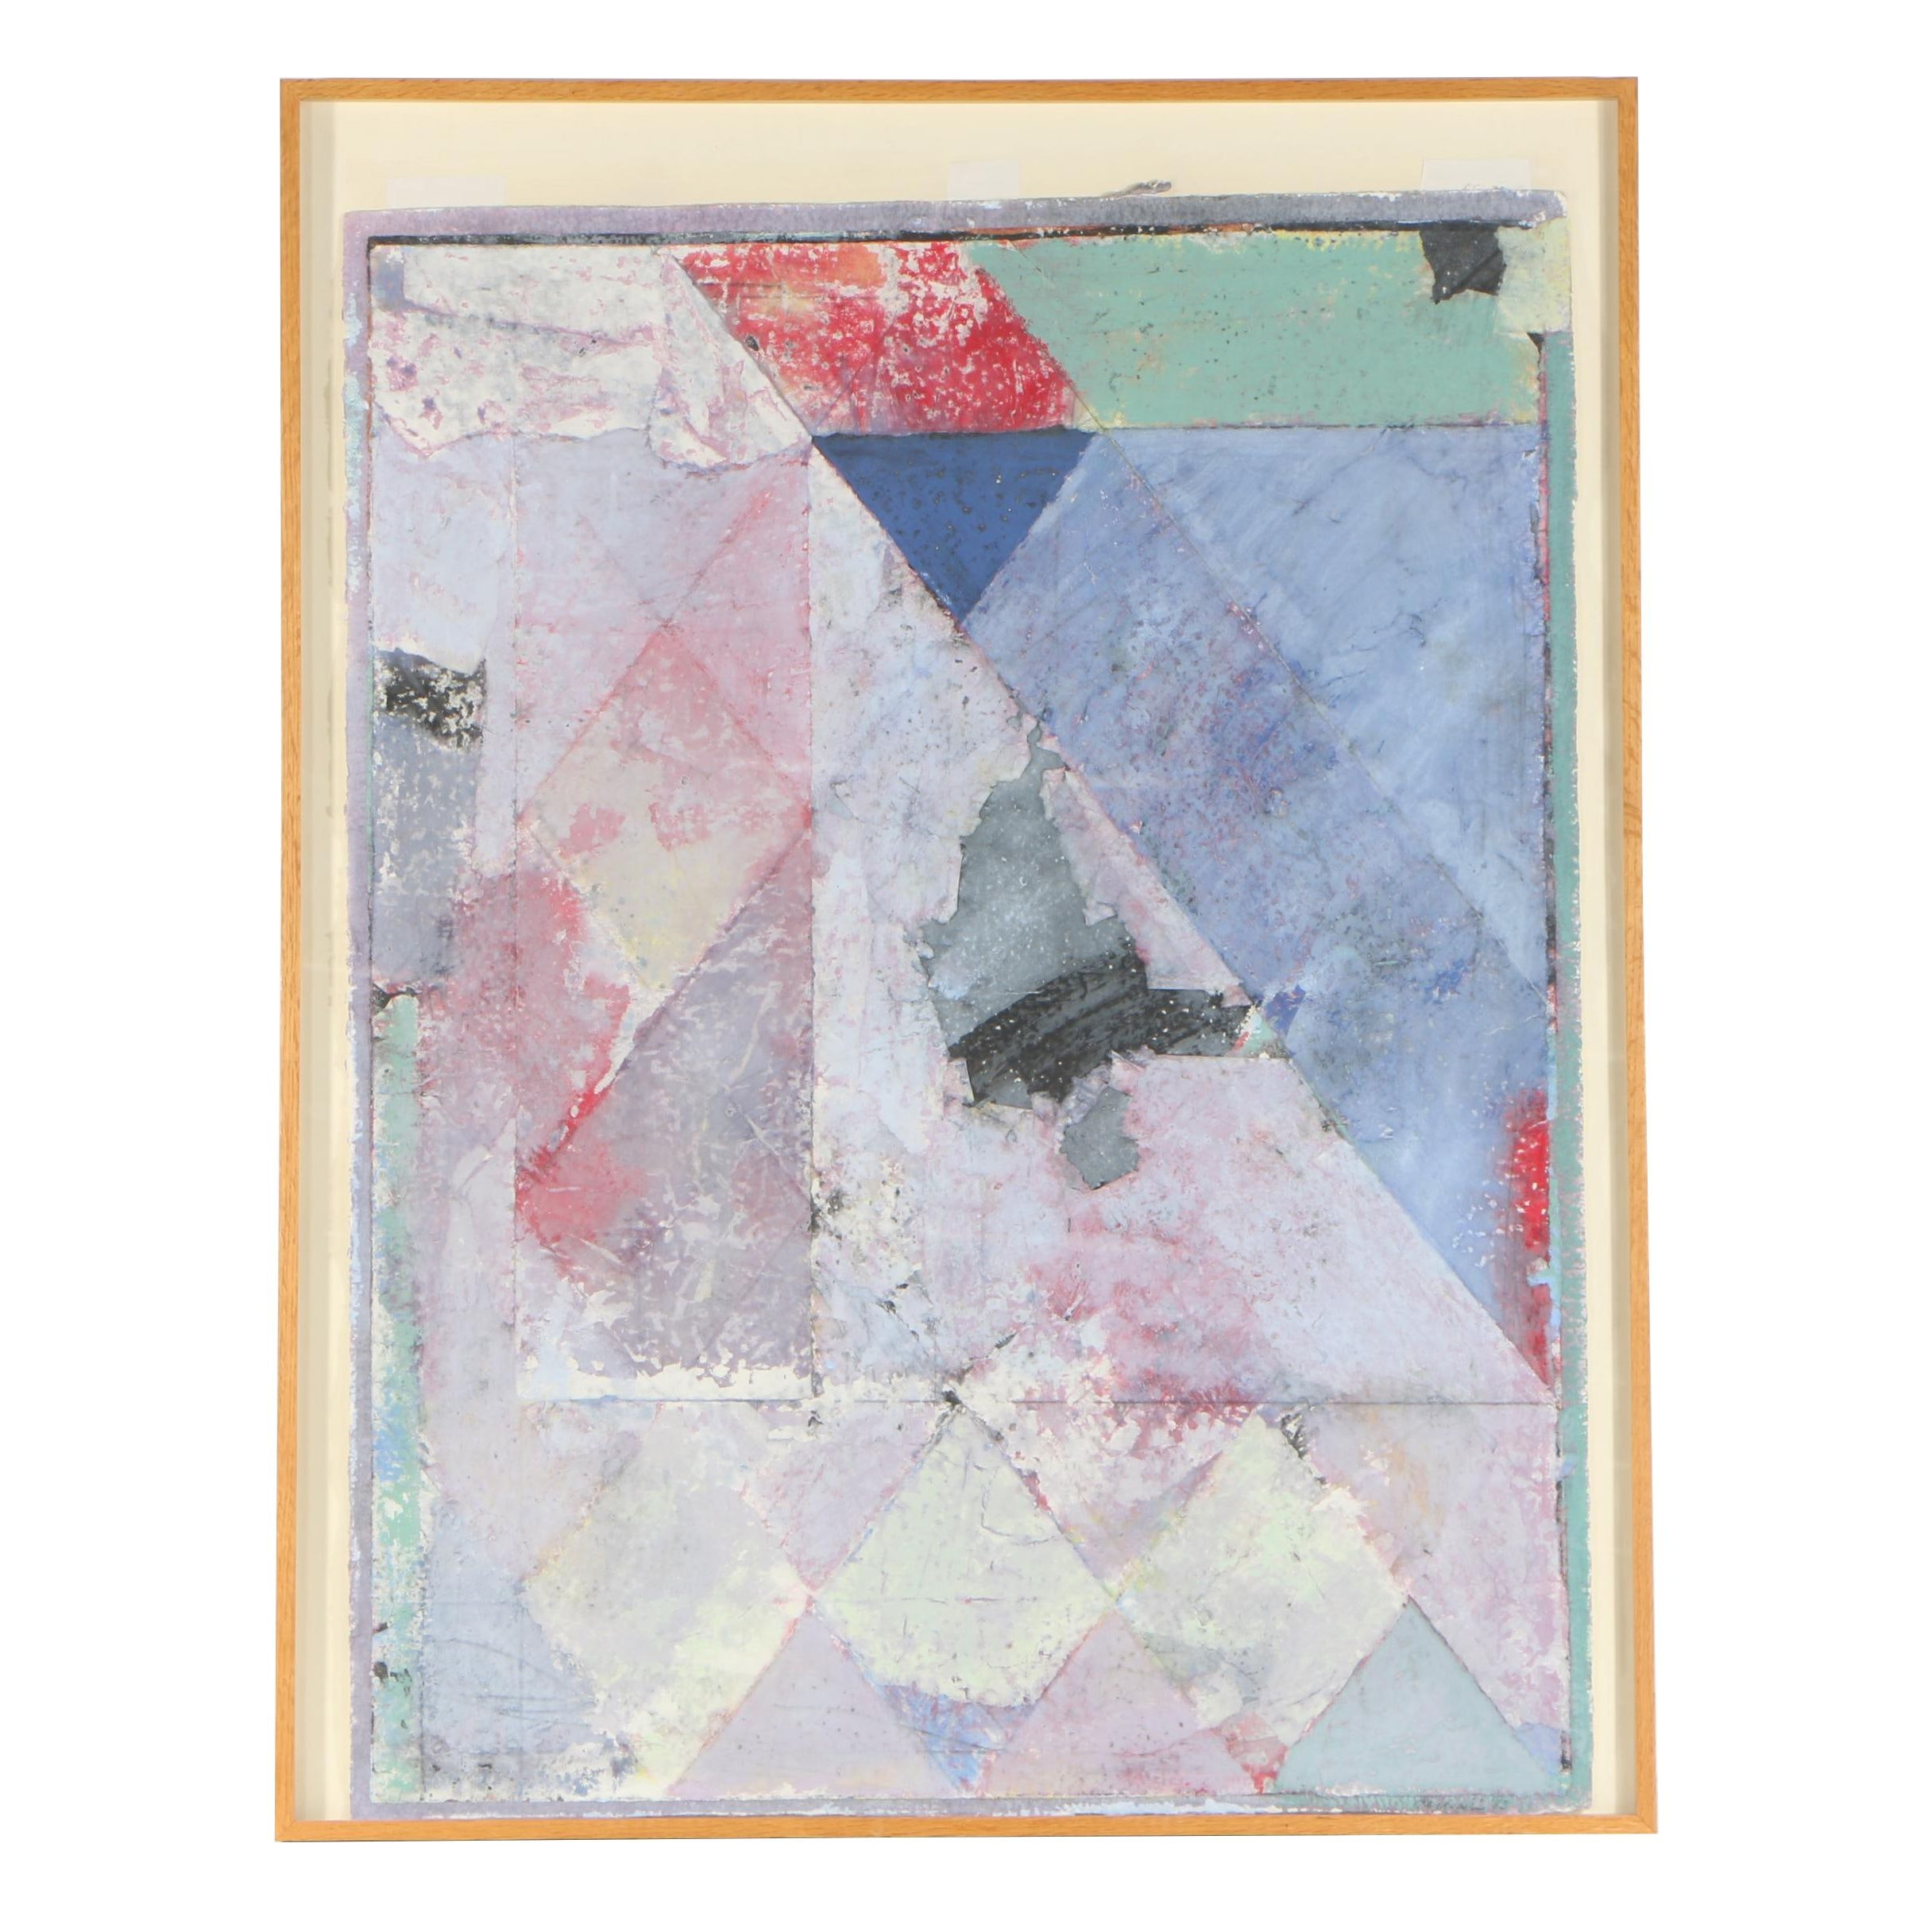 George Joji Miyasaki 1983 Acrylic and Mixed Media Painting